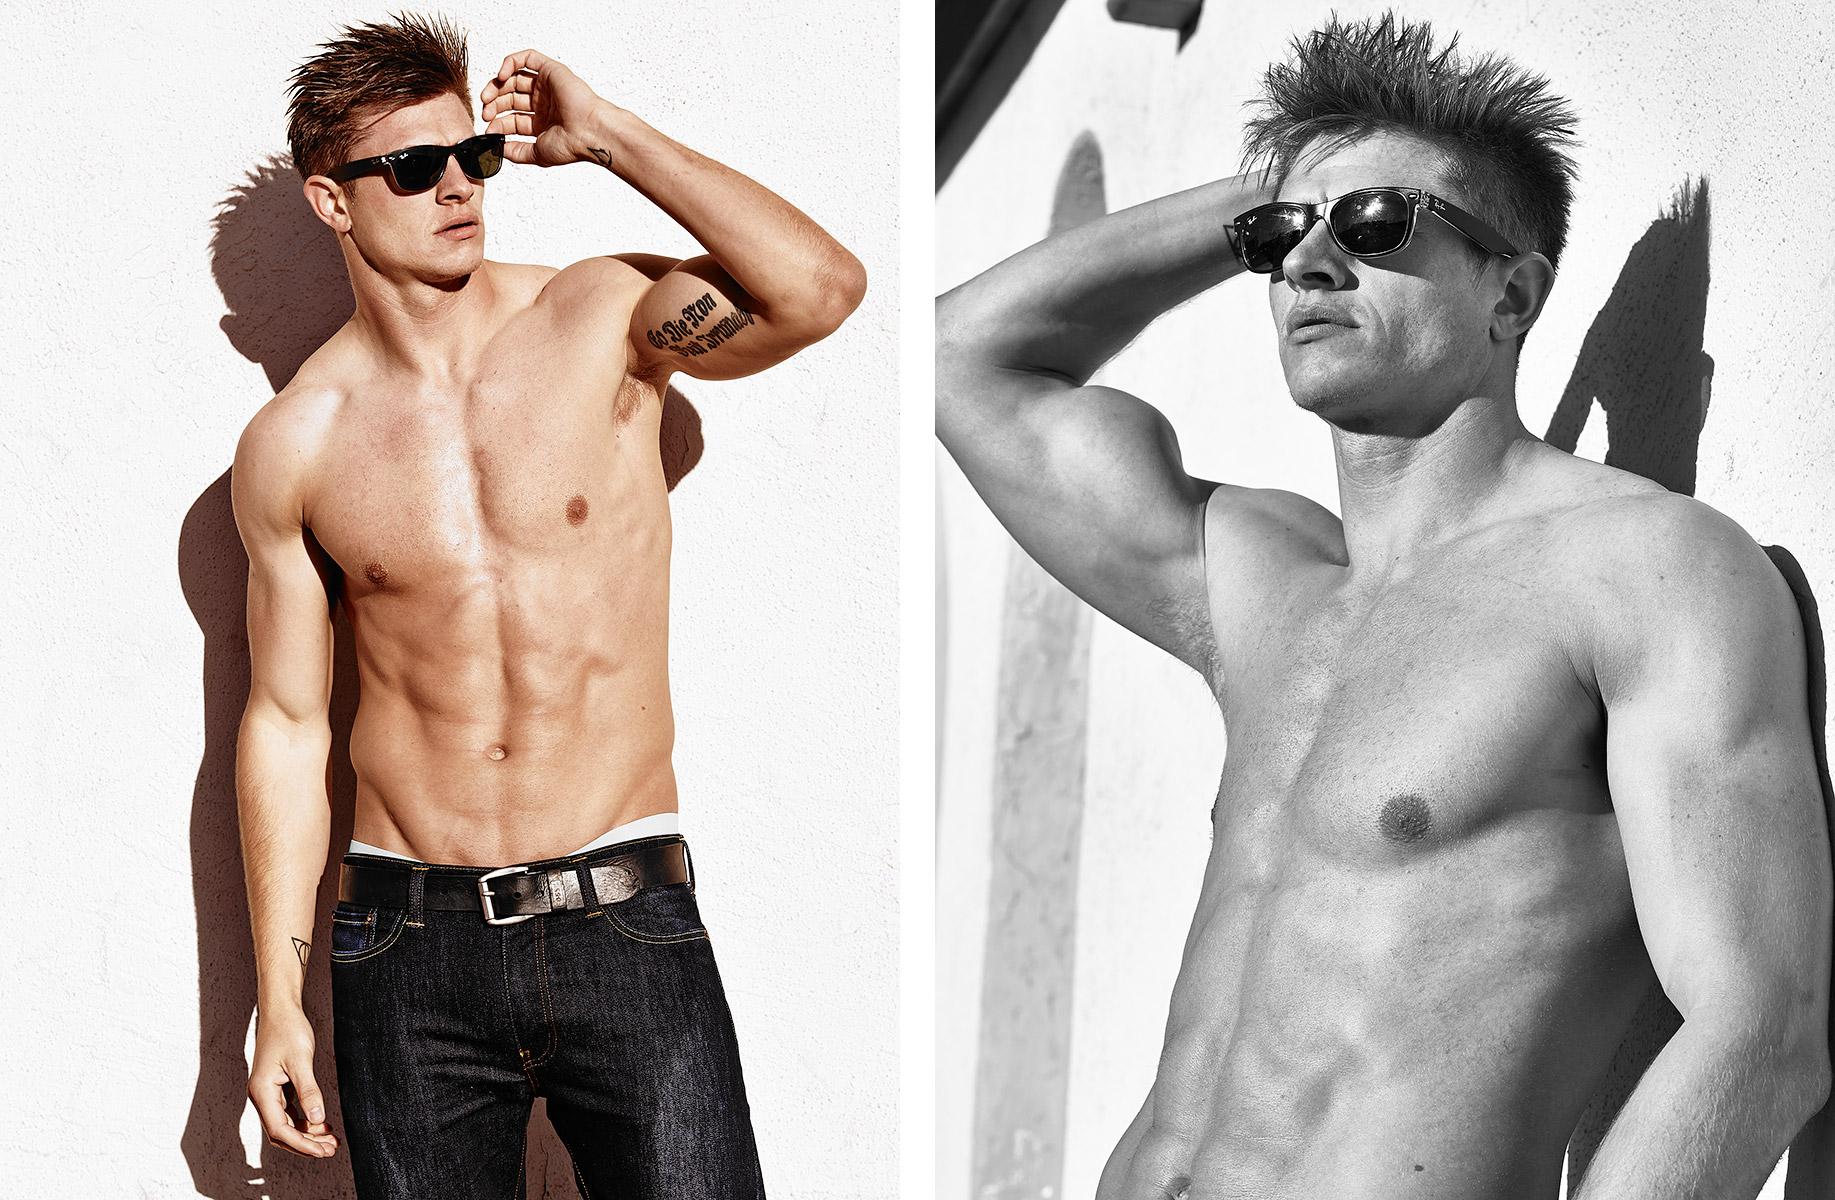 new-mexico-albuquerque-male-models-men-5.jpg